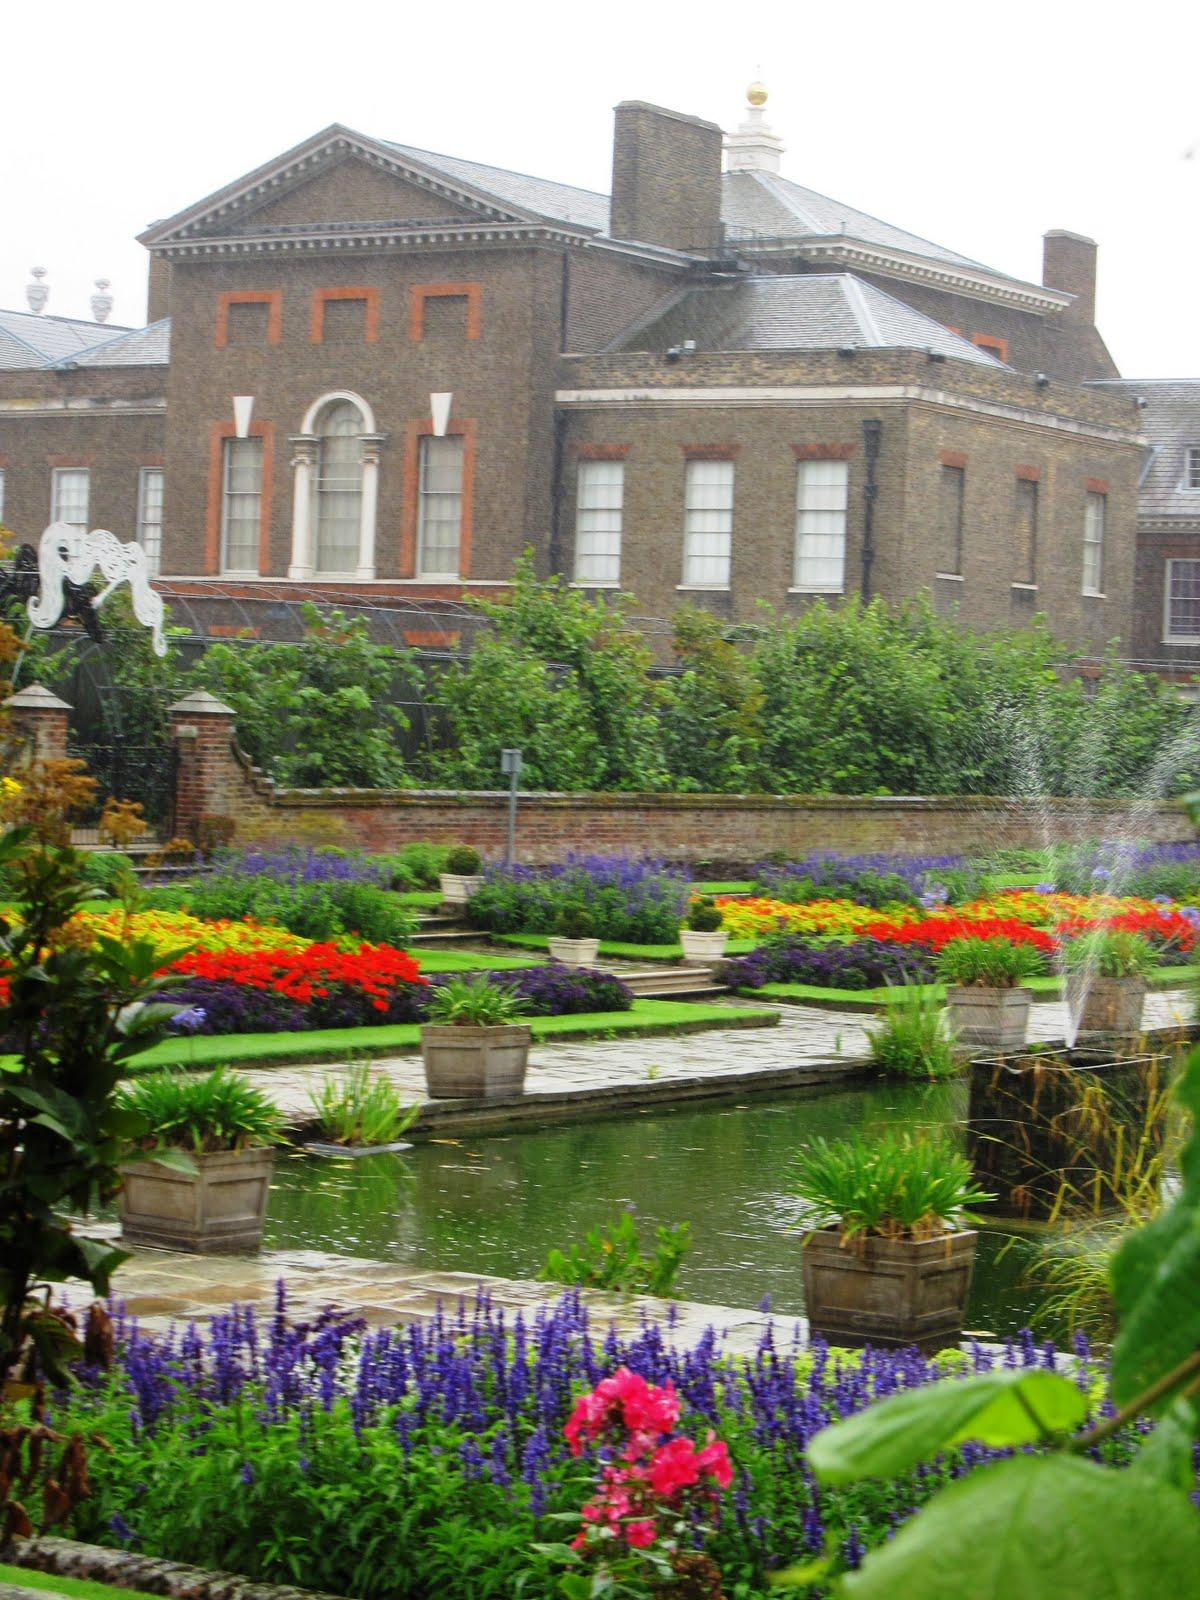 http://1.bp.blogspot.com/_g09CYhYht8Q/TGGsprVfImI/AAAAAAAABqI/1EID69-ZJ-k/s1600/Kensington+Garden+%2B+Palace.JPG